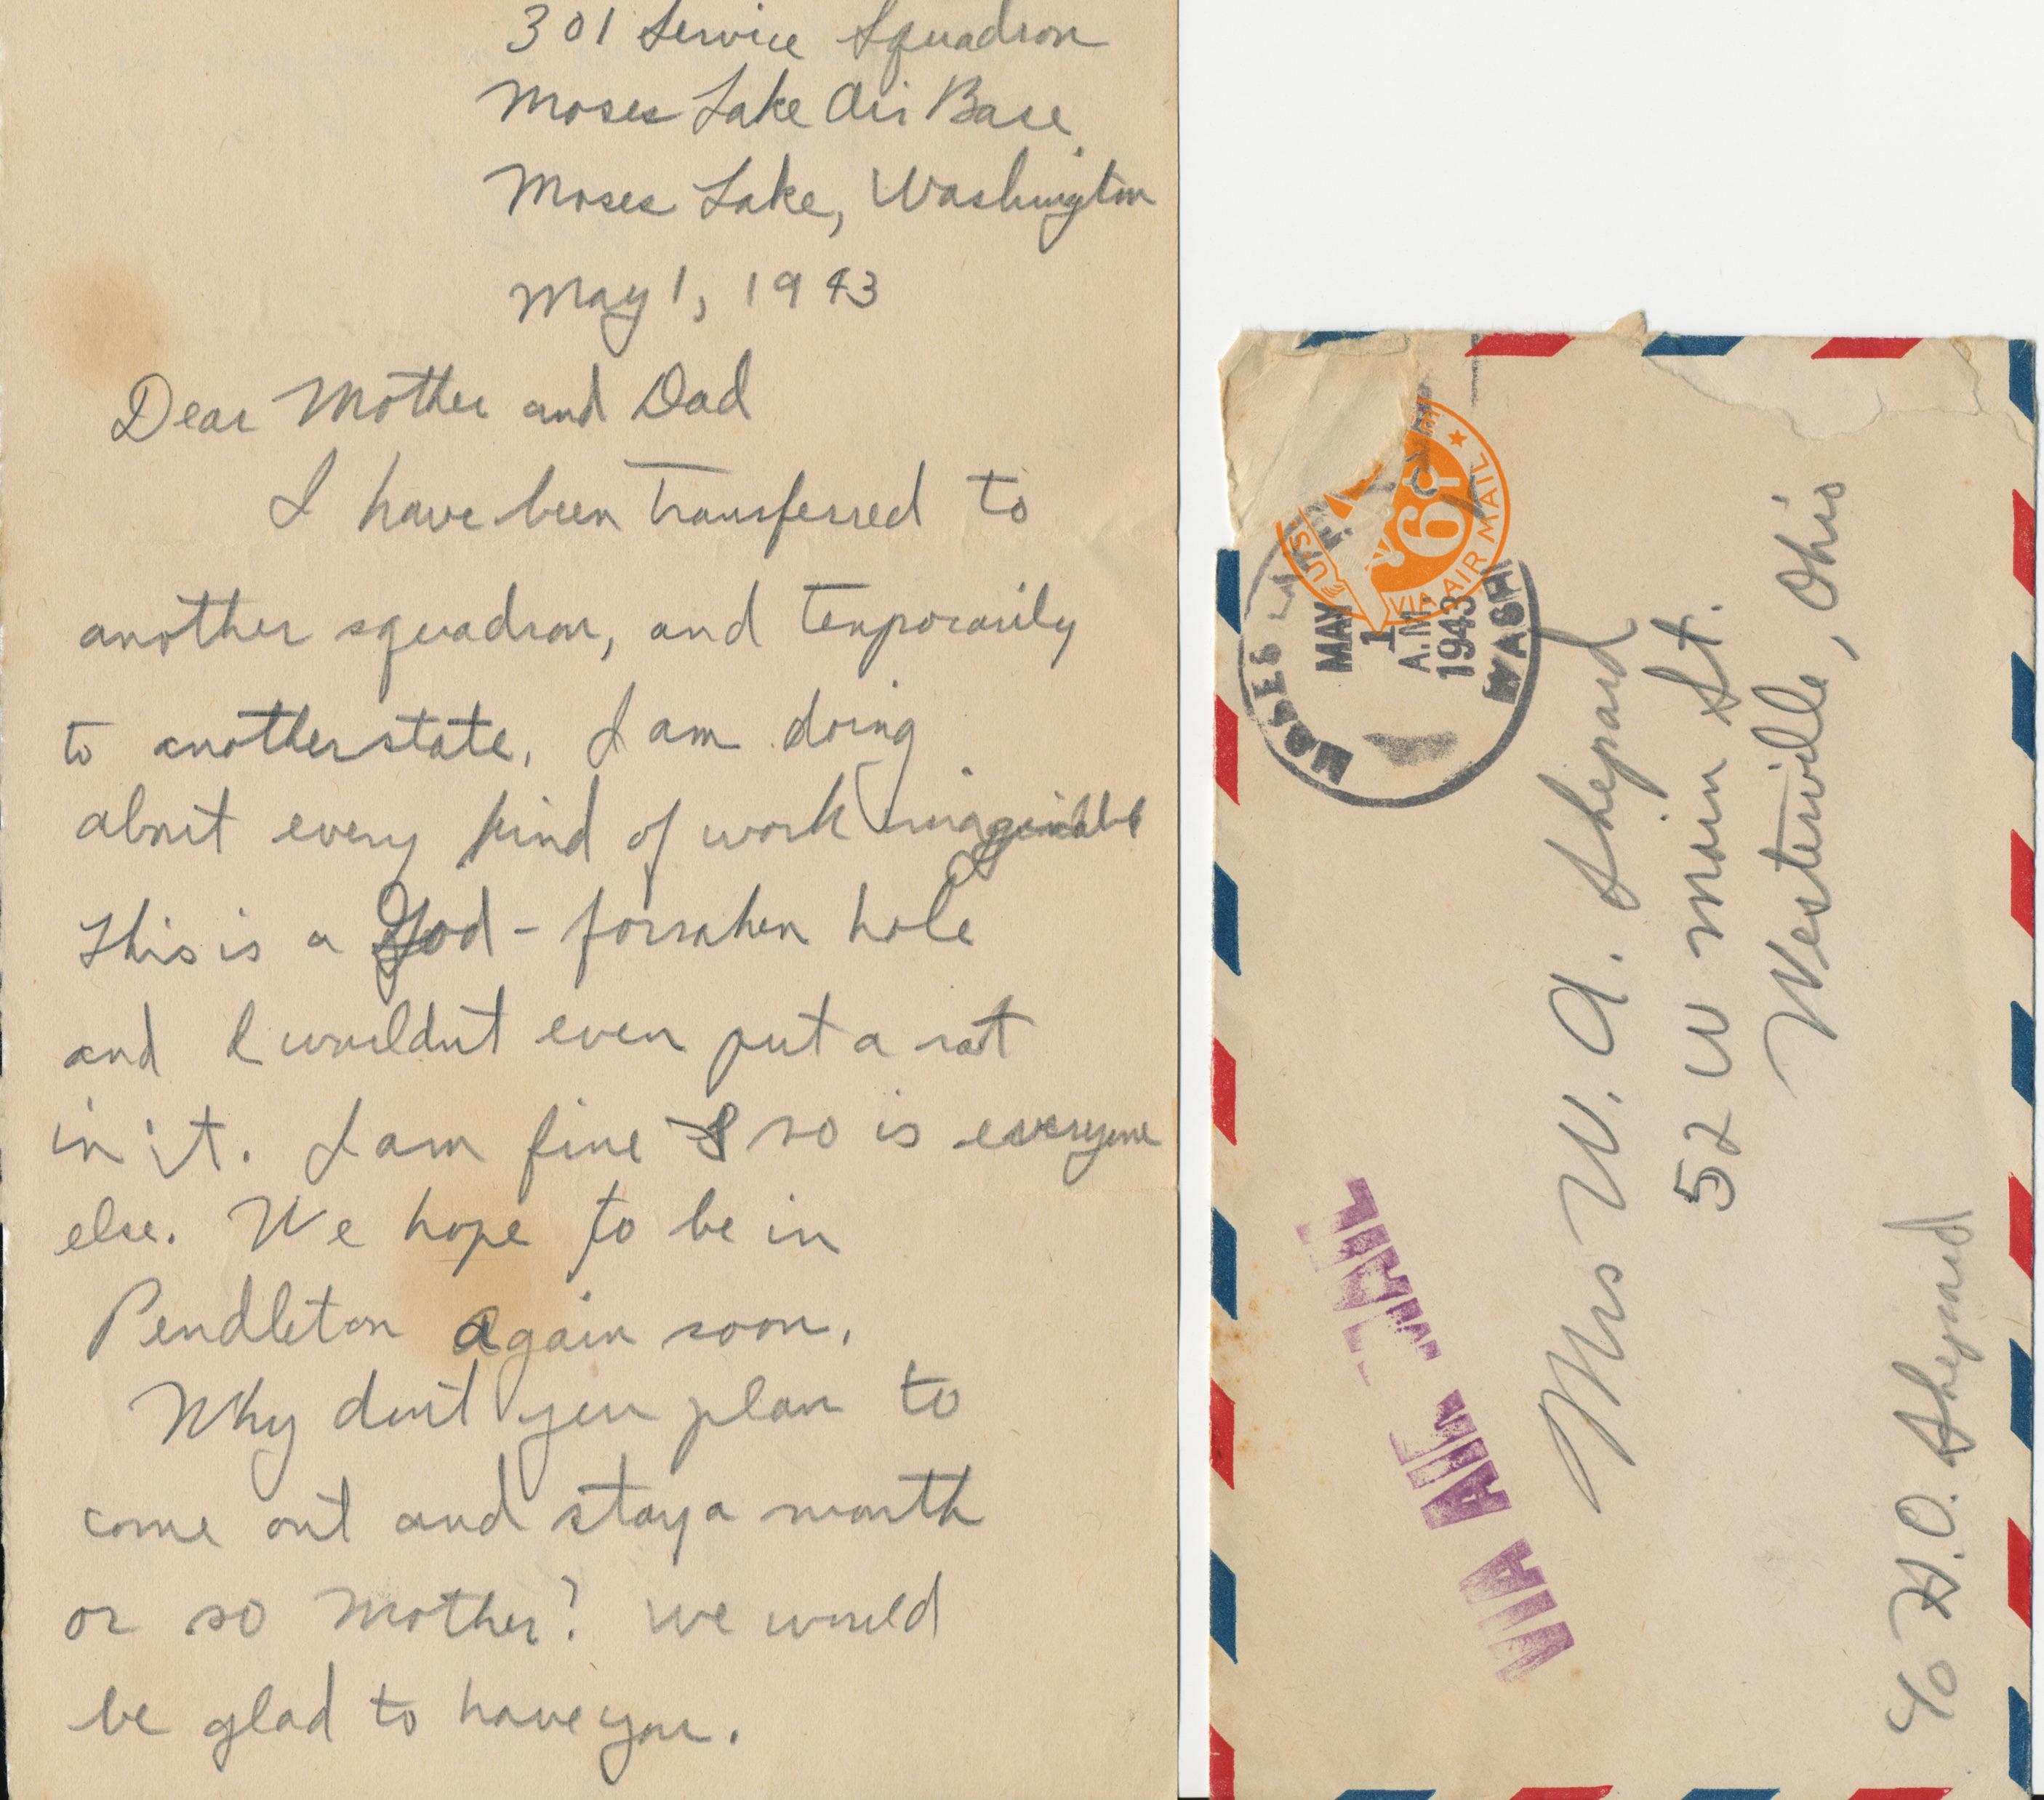 letter_shepardw_to_shepardwr_1943_05_01_p01andenv